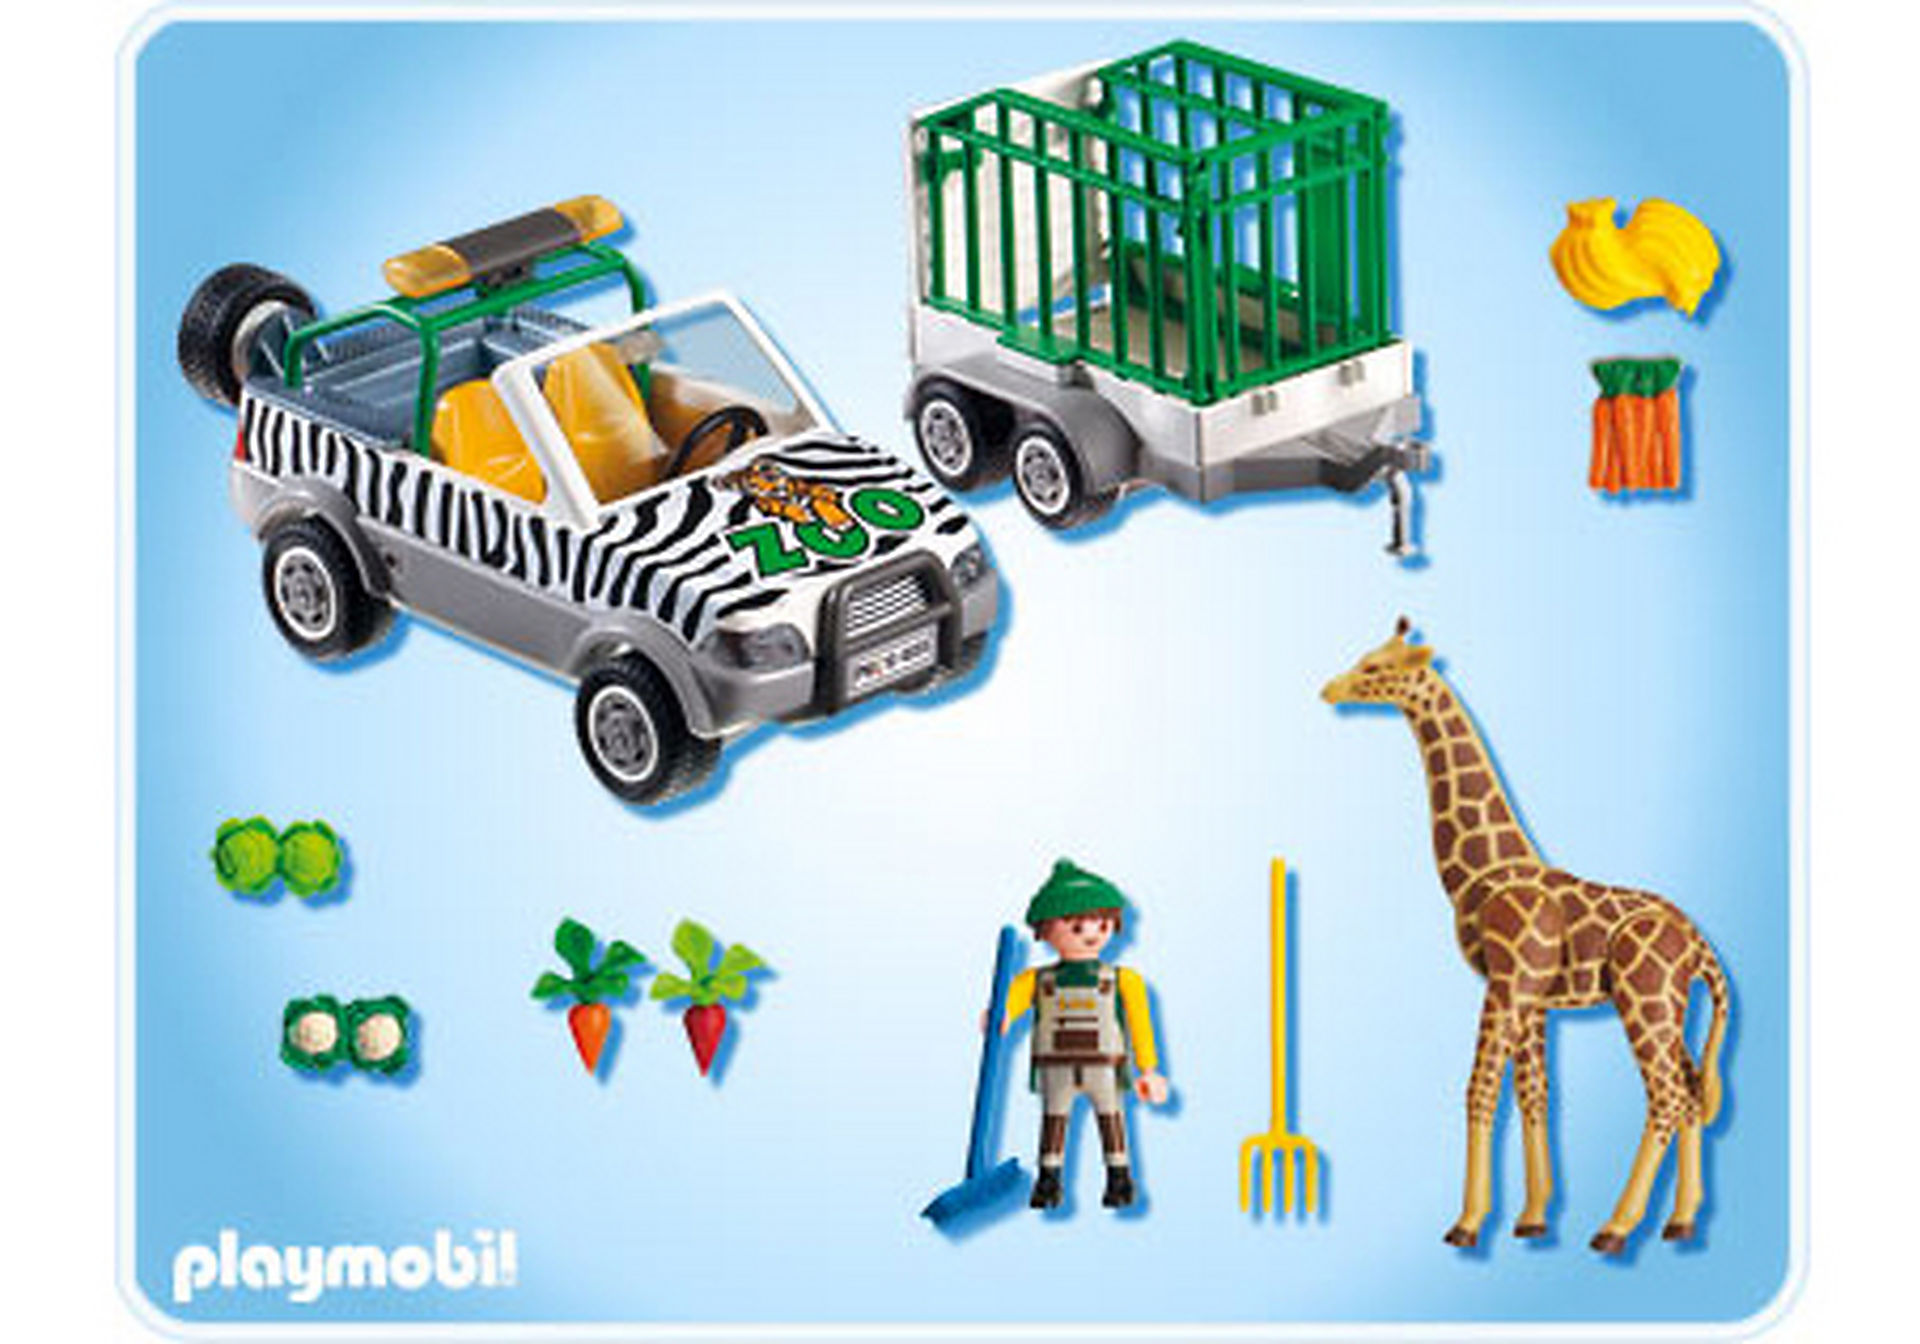 4855-A Zoo-Fahrzeug mit Anhänger zoom image2